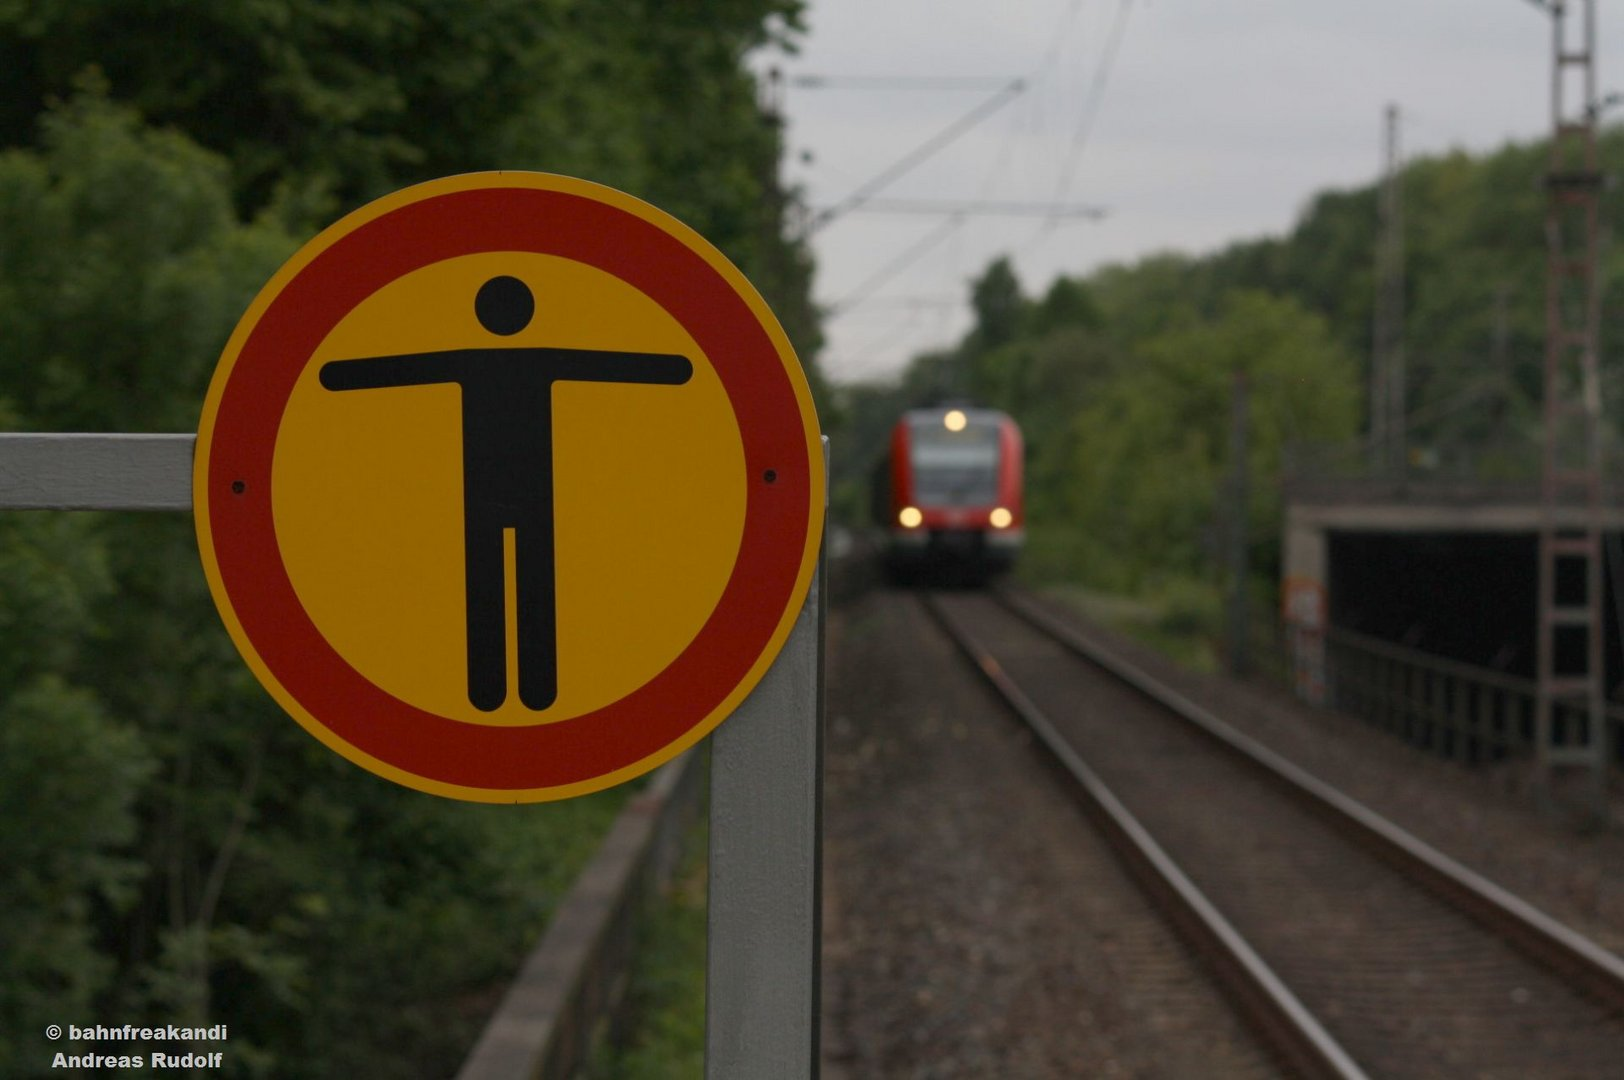 Durchgang verboten!